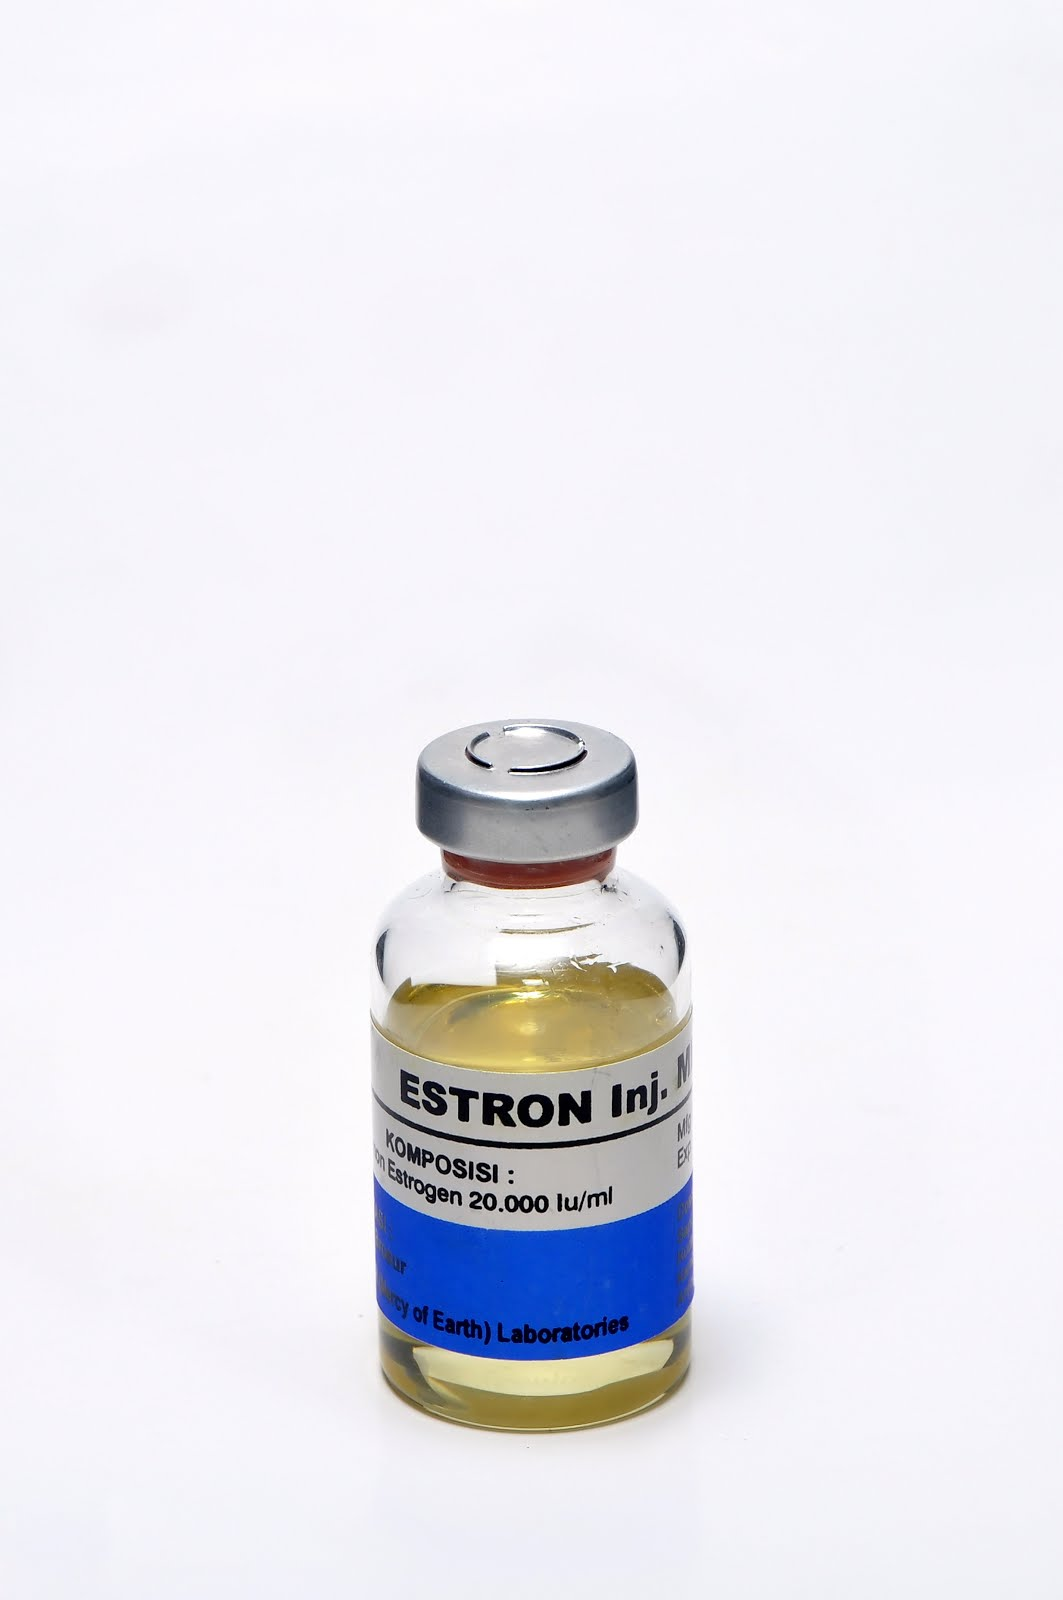 Estron Inj. Meyer